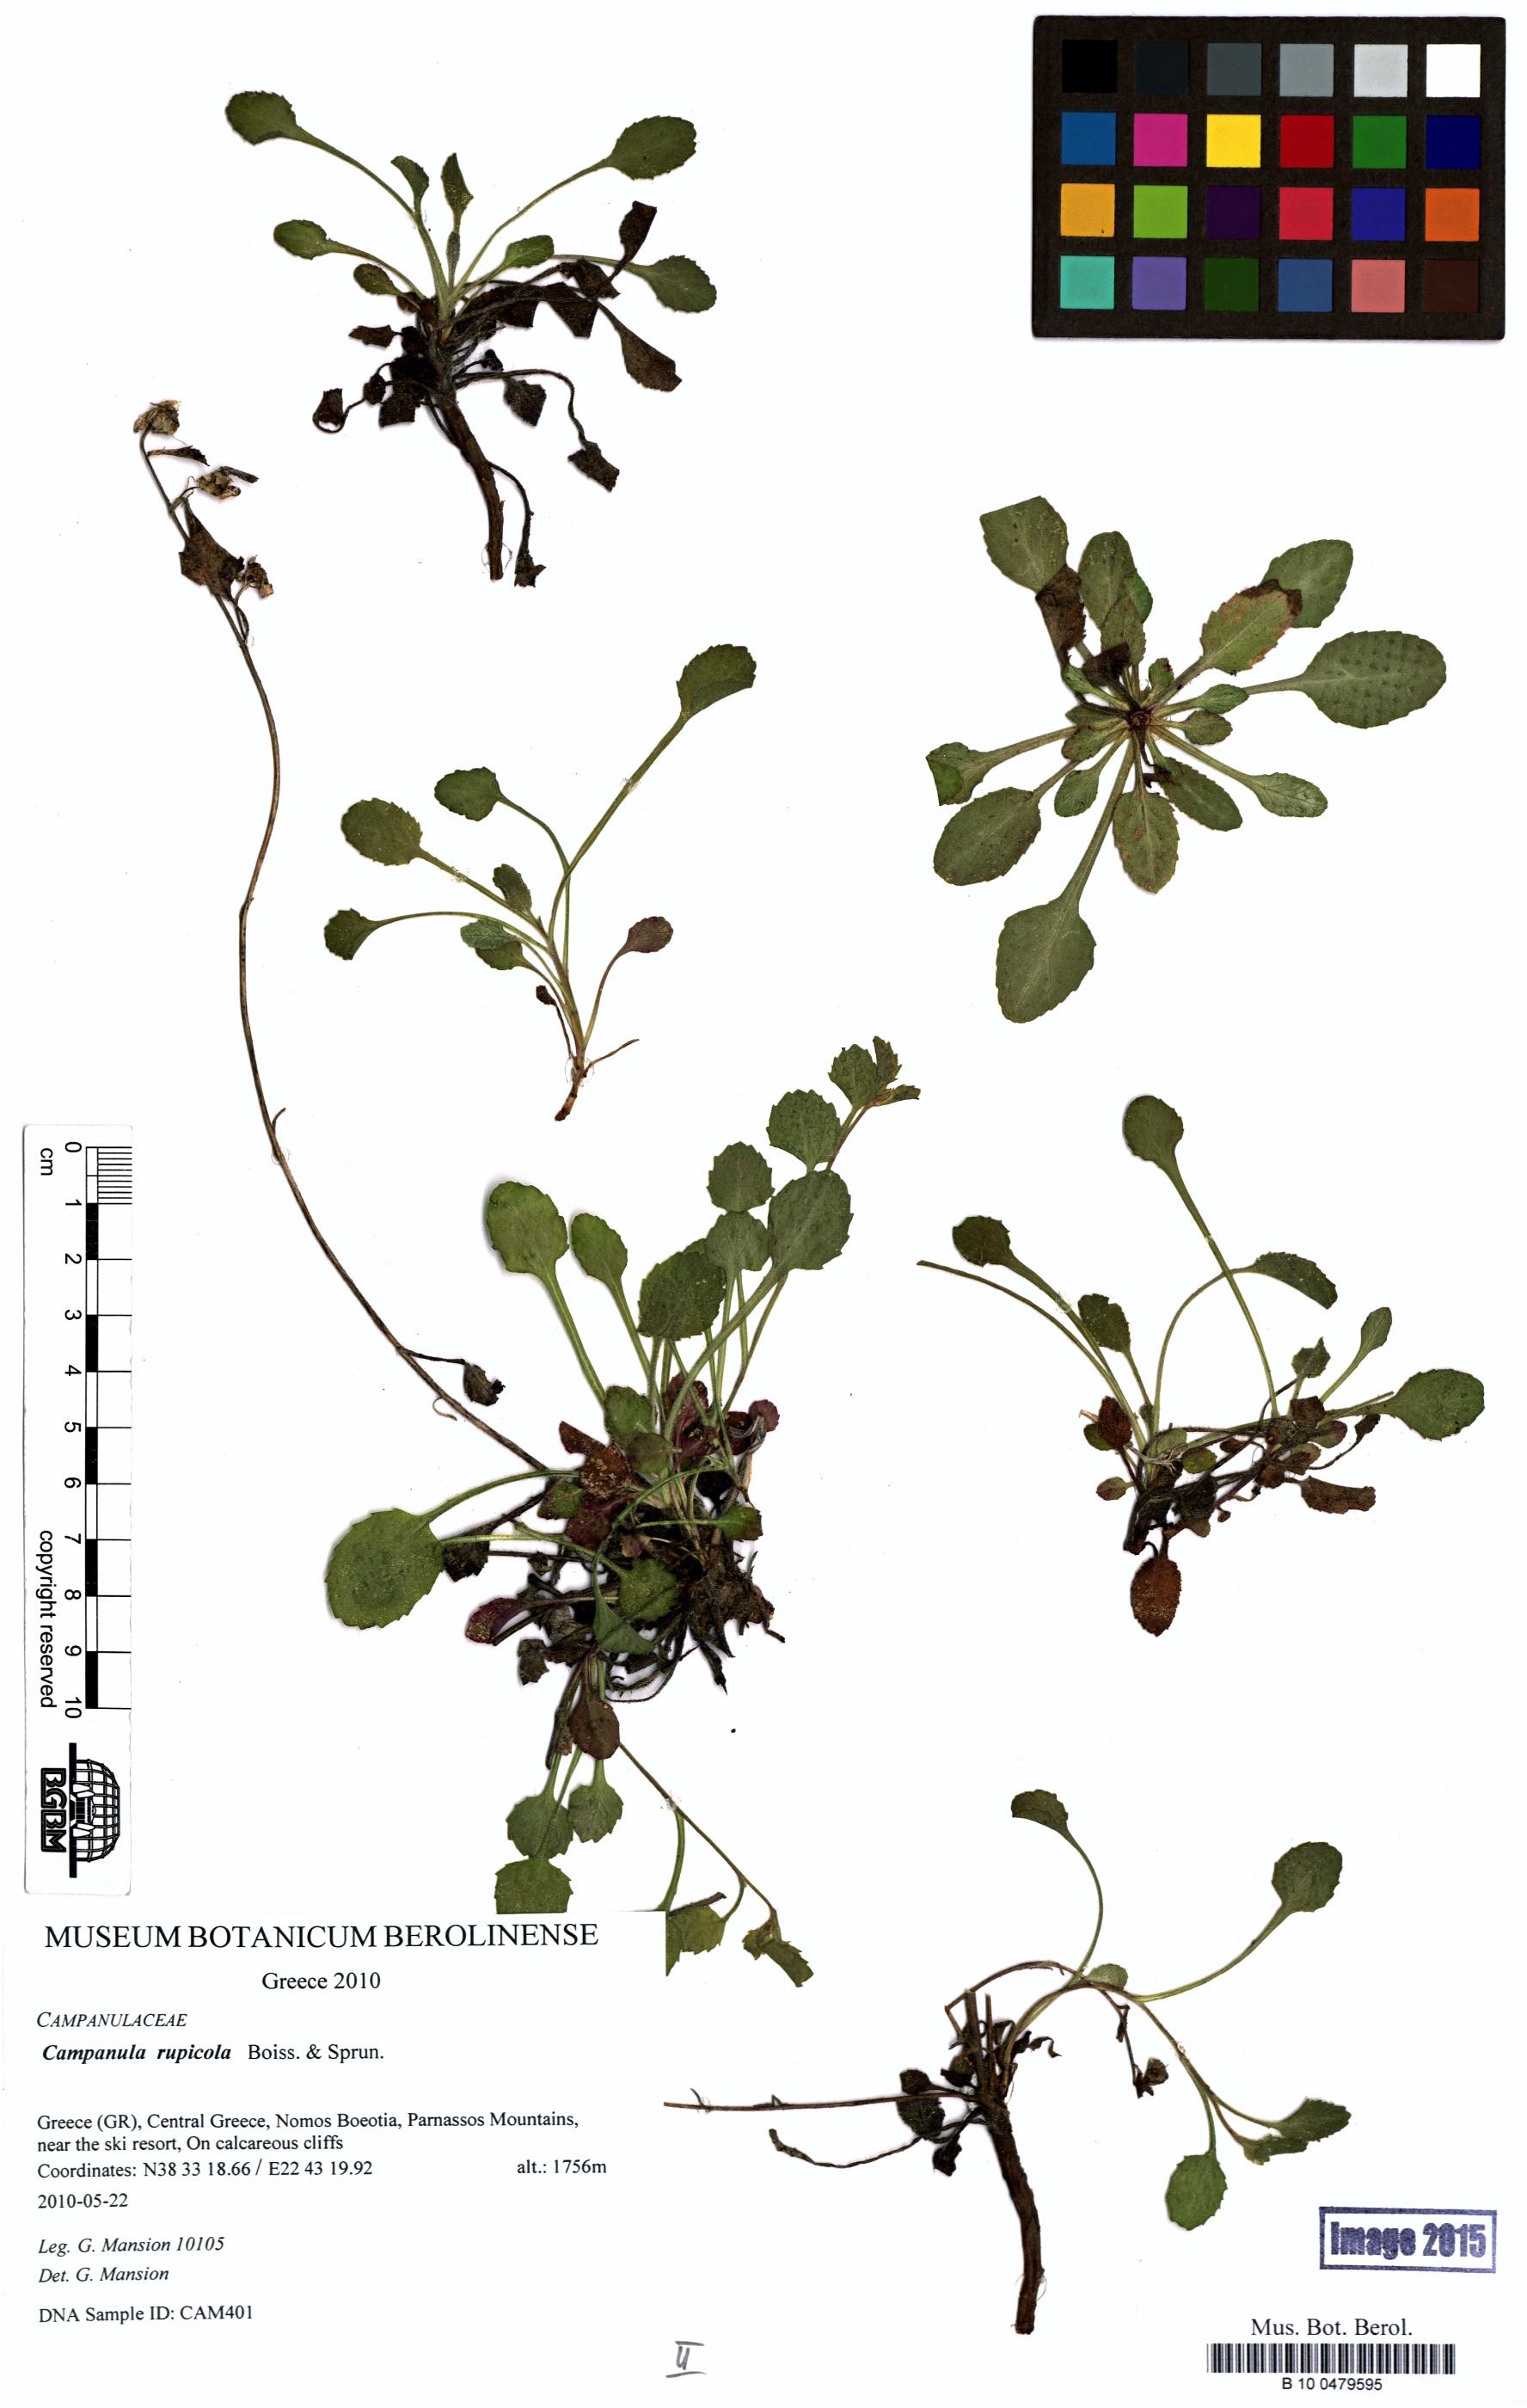 http://ww2.bgbm.org/herbarium/images/B/10/04/79/59/B_10_0479595.jpg